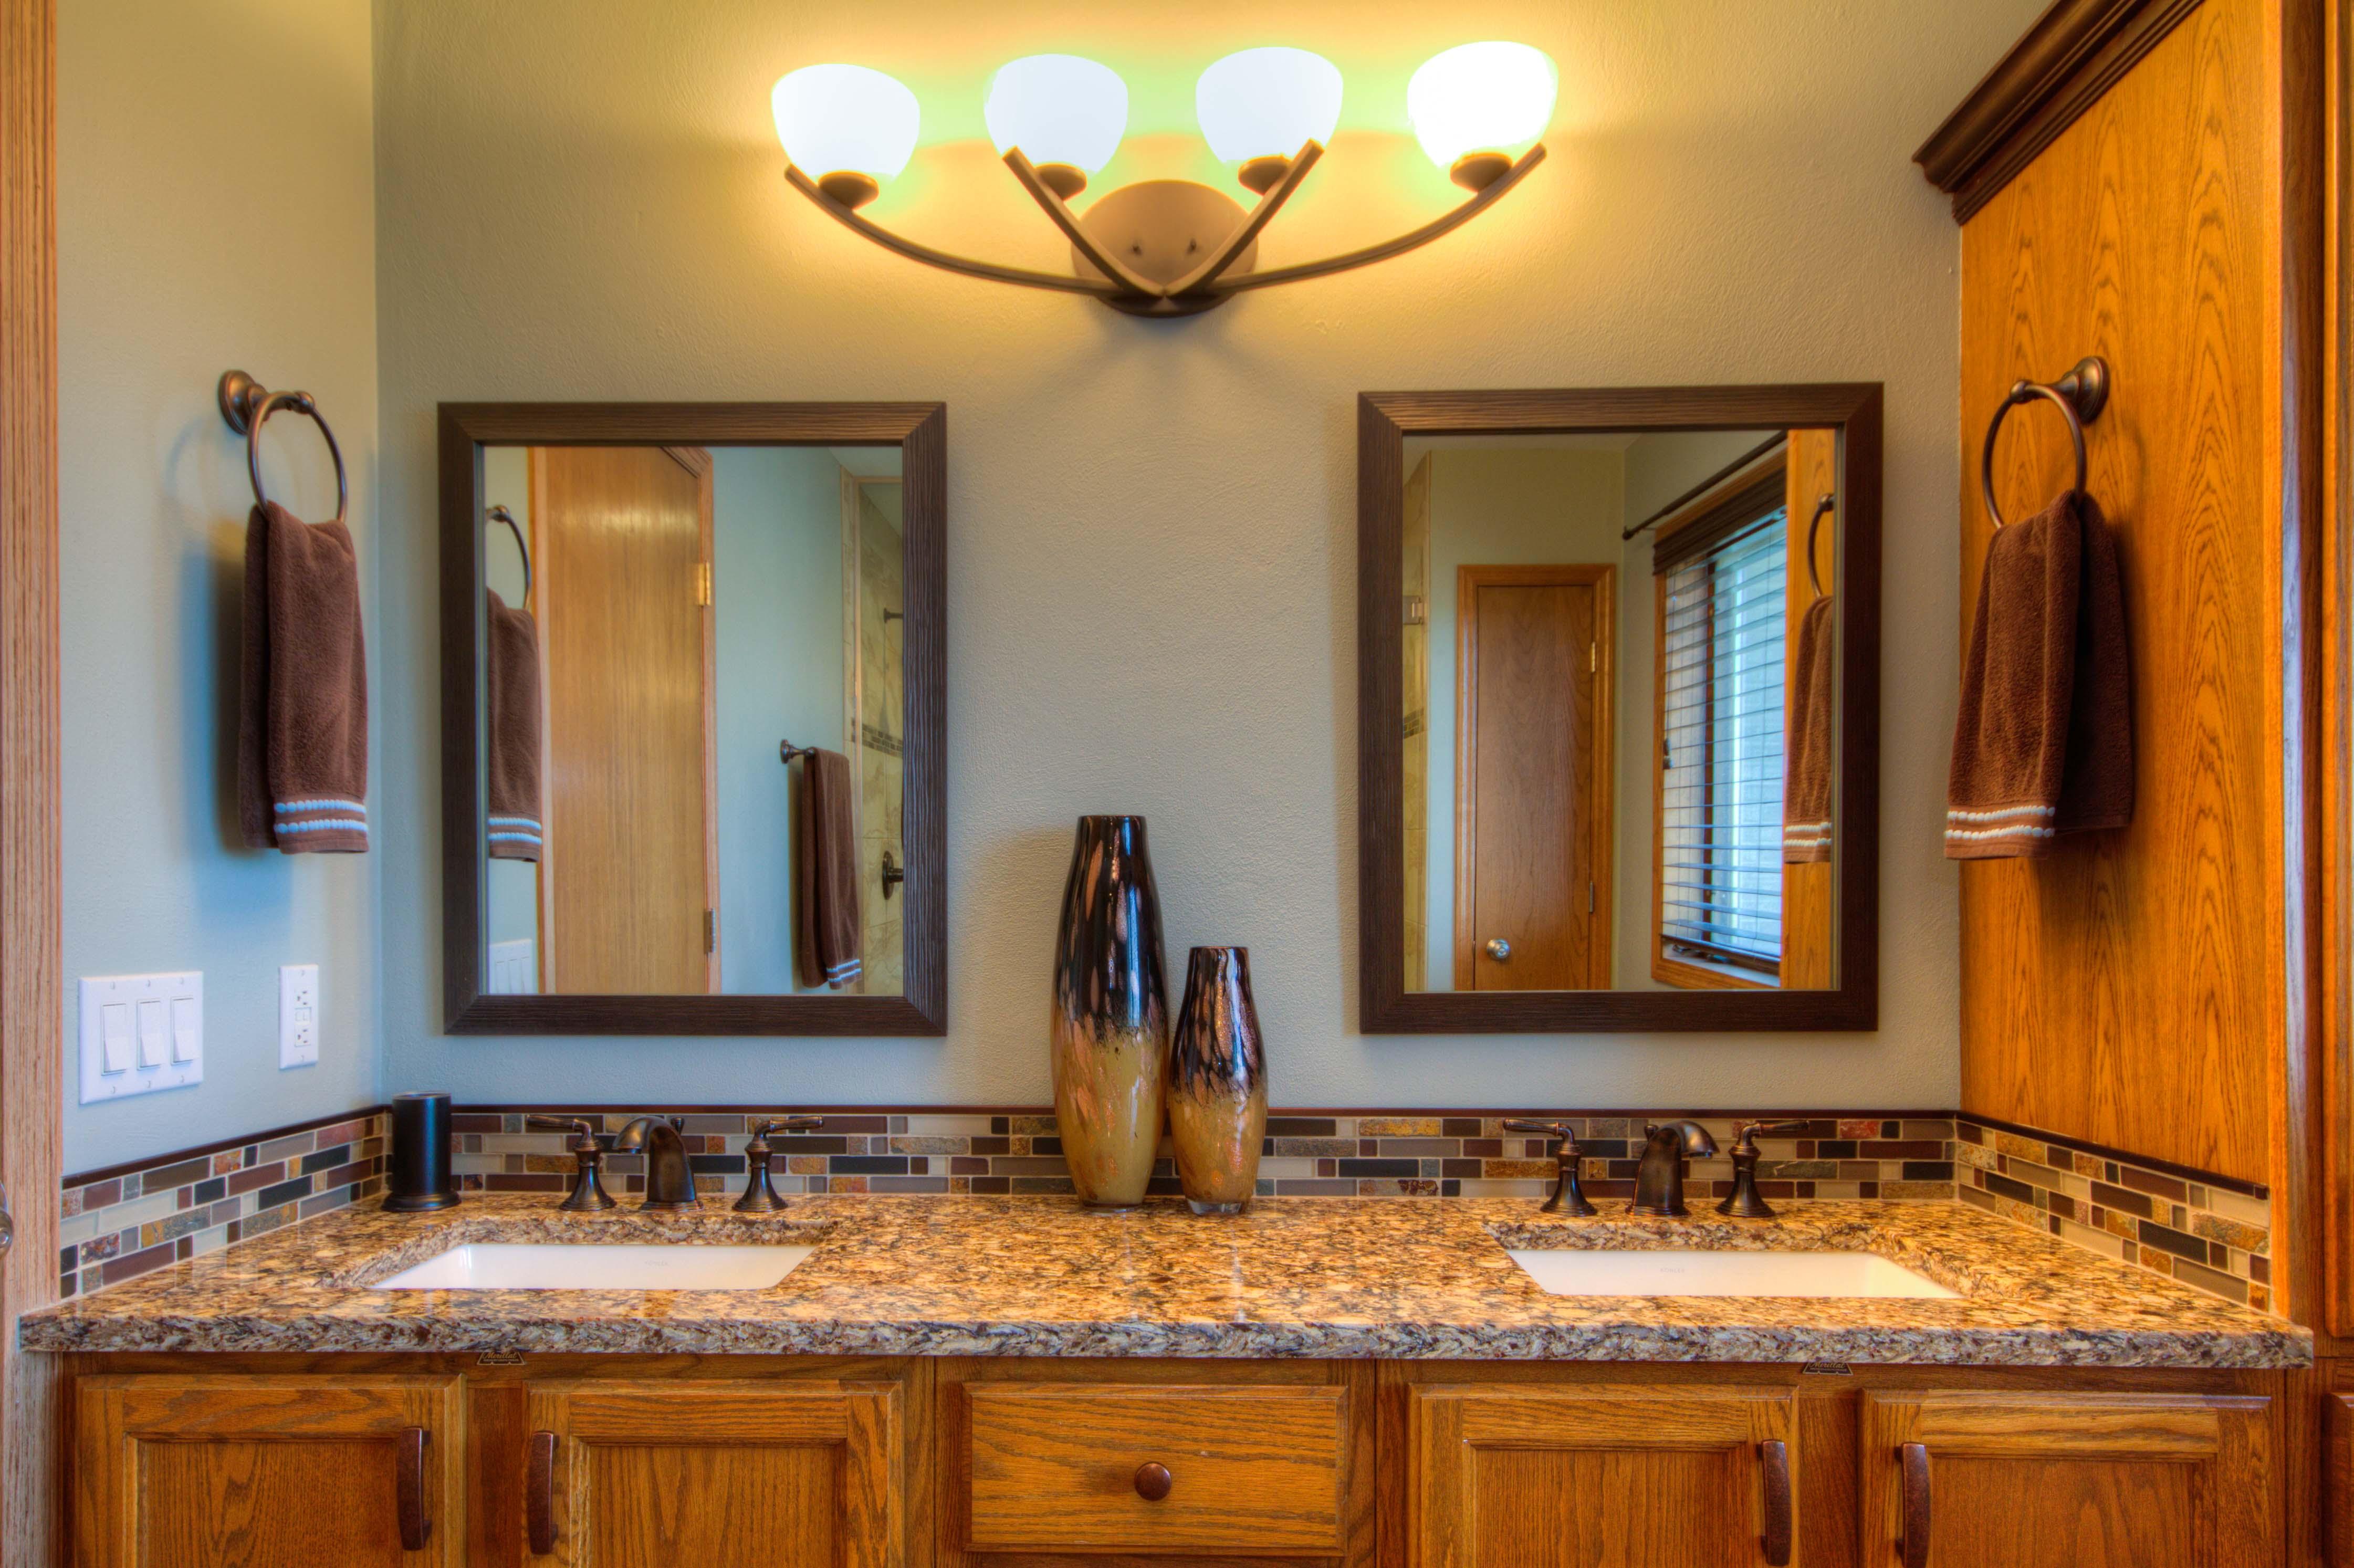 Bathroom Design, oak vanity cabinets, cambria countertop, double sink oak cabinet